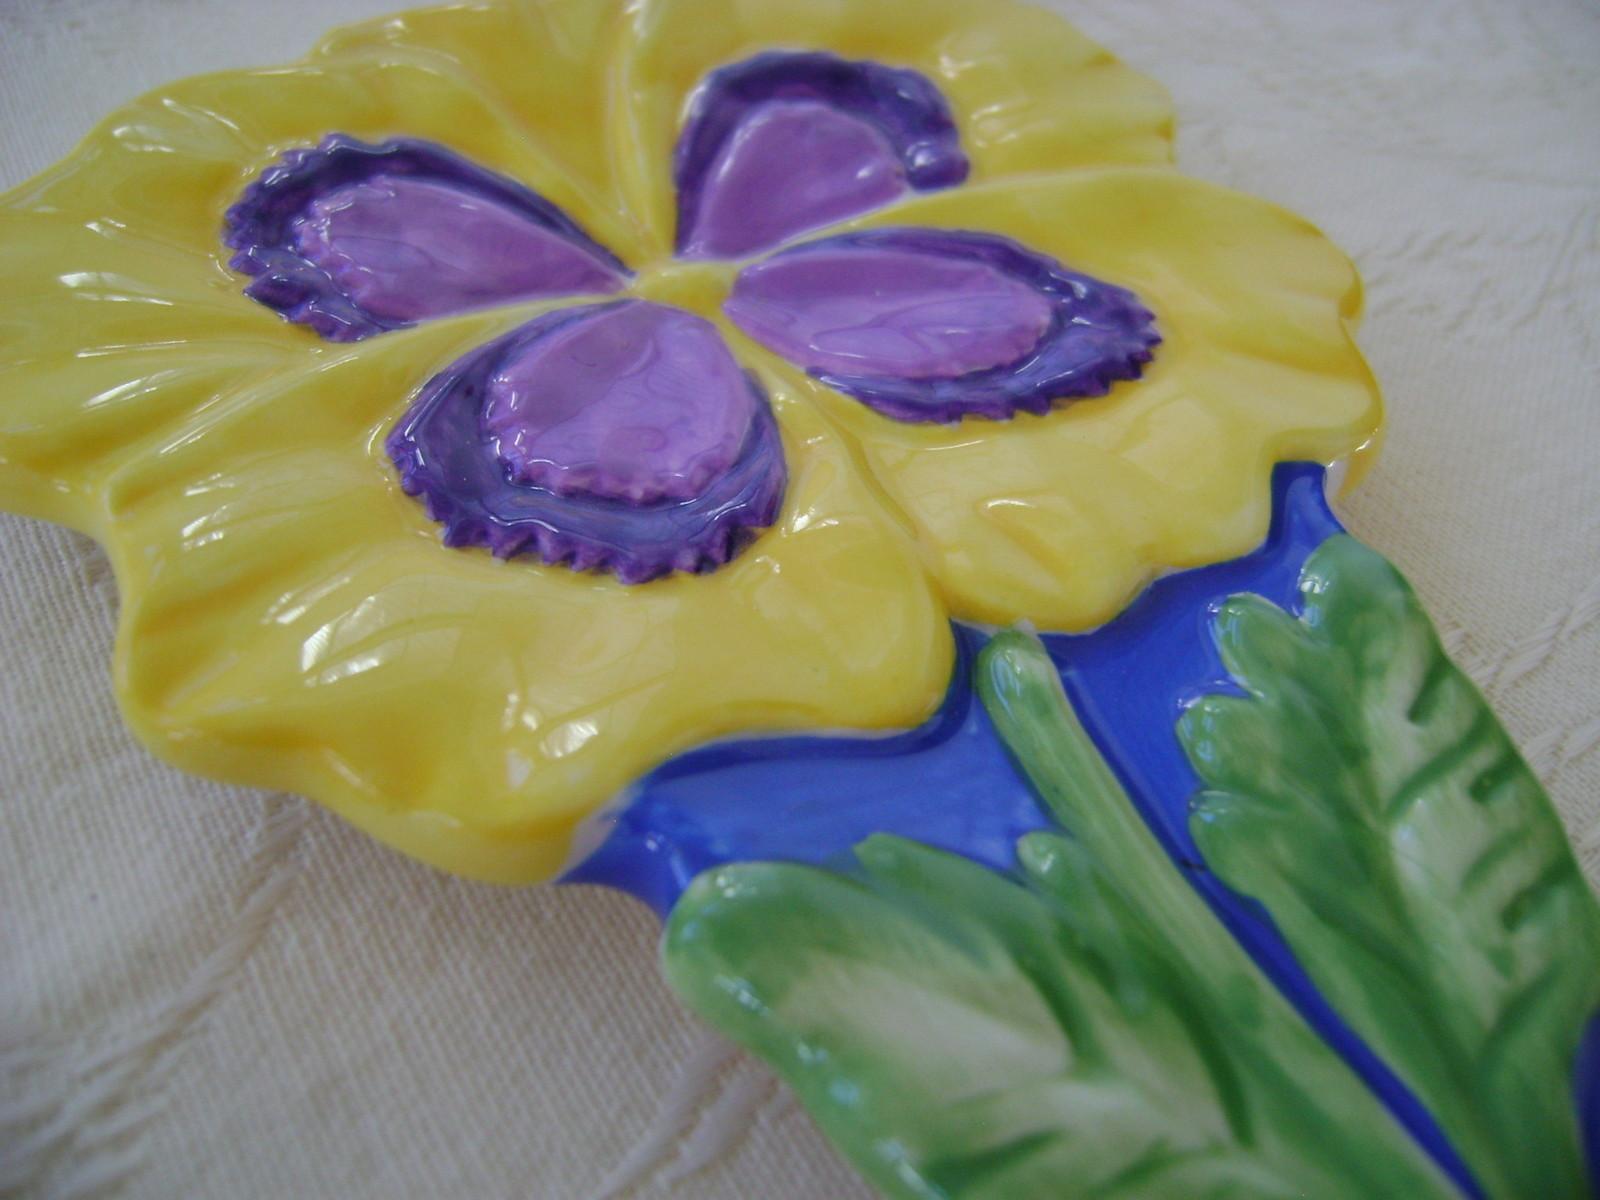 Spoon Rest, Ceramic, Pansy, Flower Daze Collection